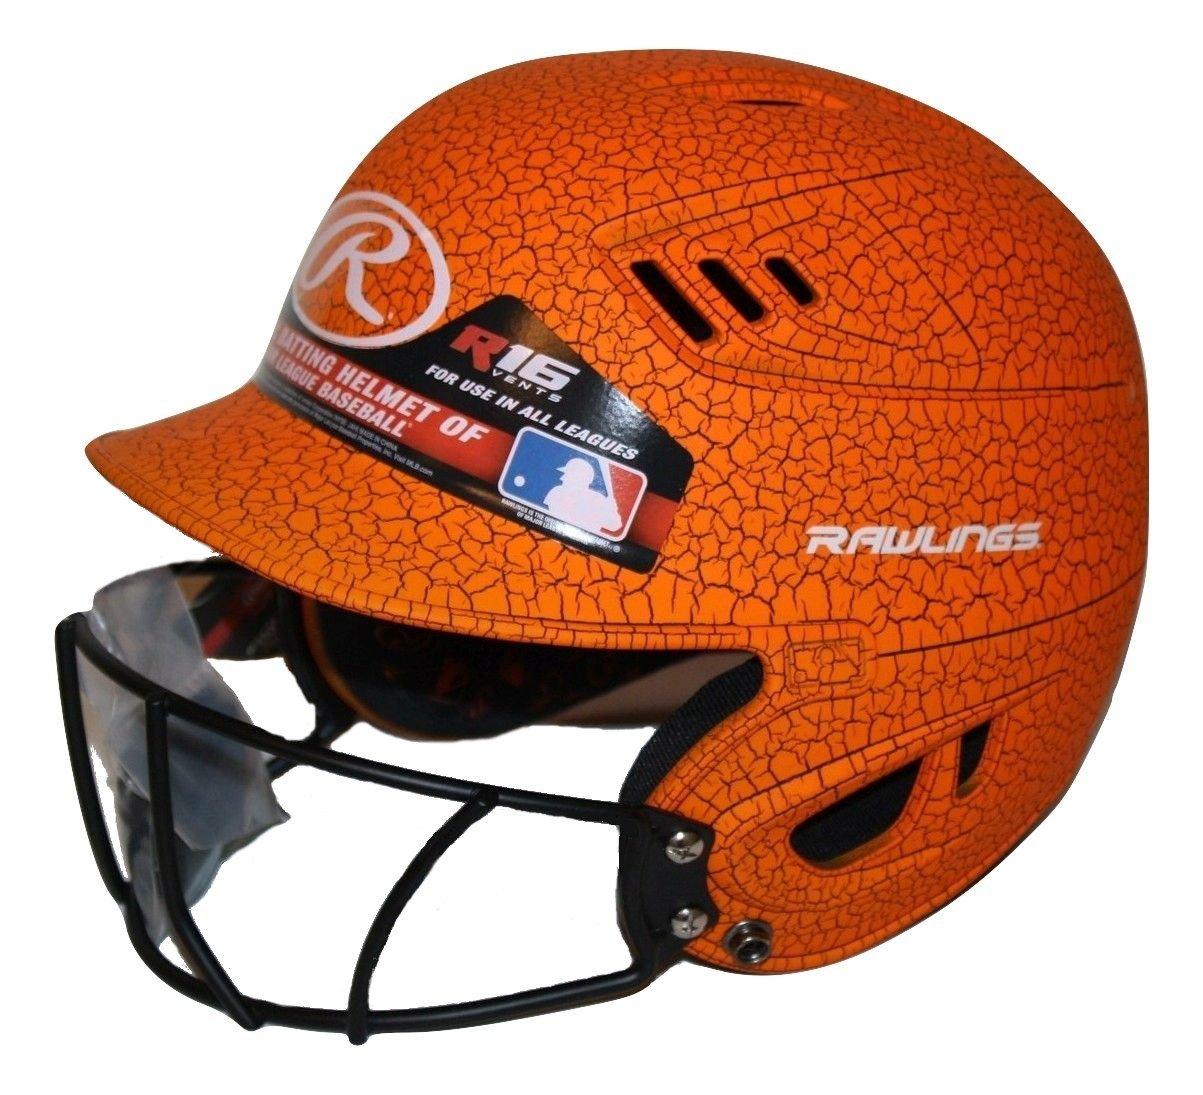 Rawlings Velo Junior R16 Series Crackle Batting Helmet with Face Mask Junior)